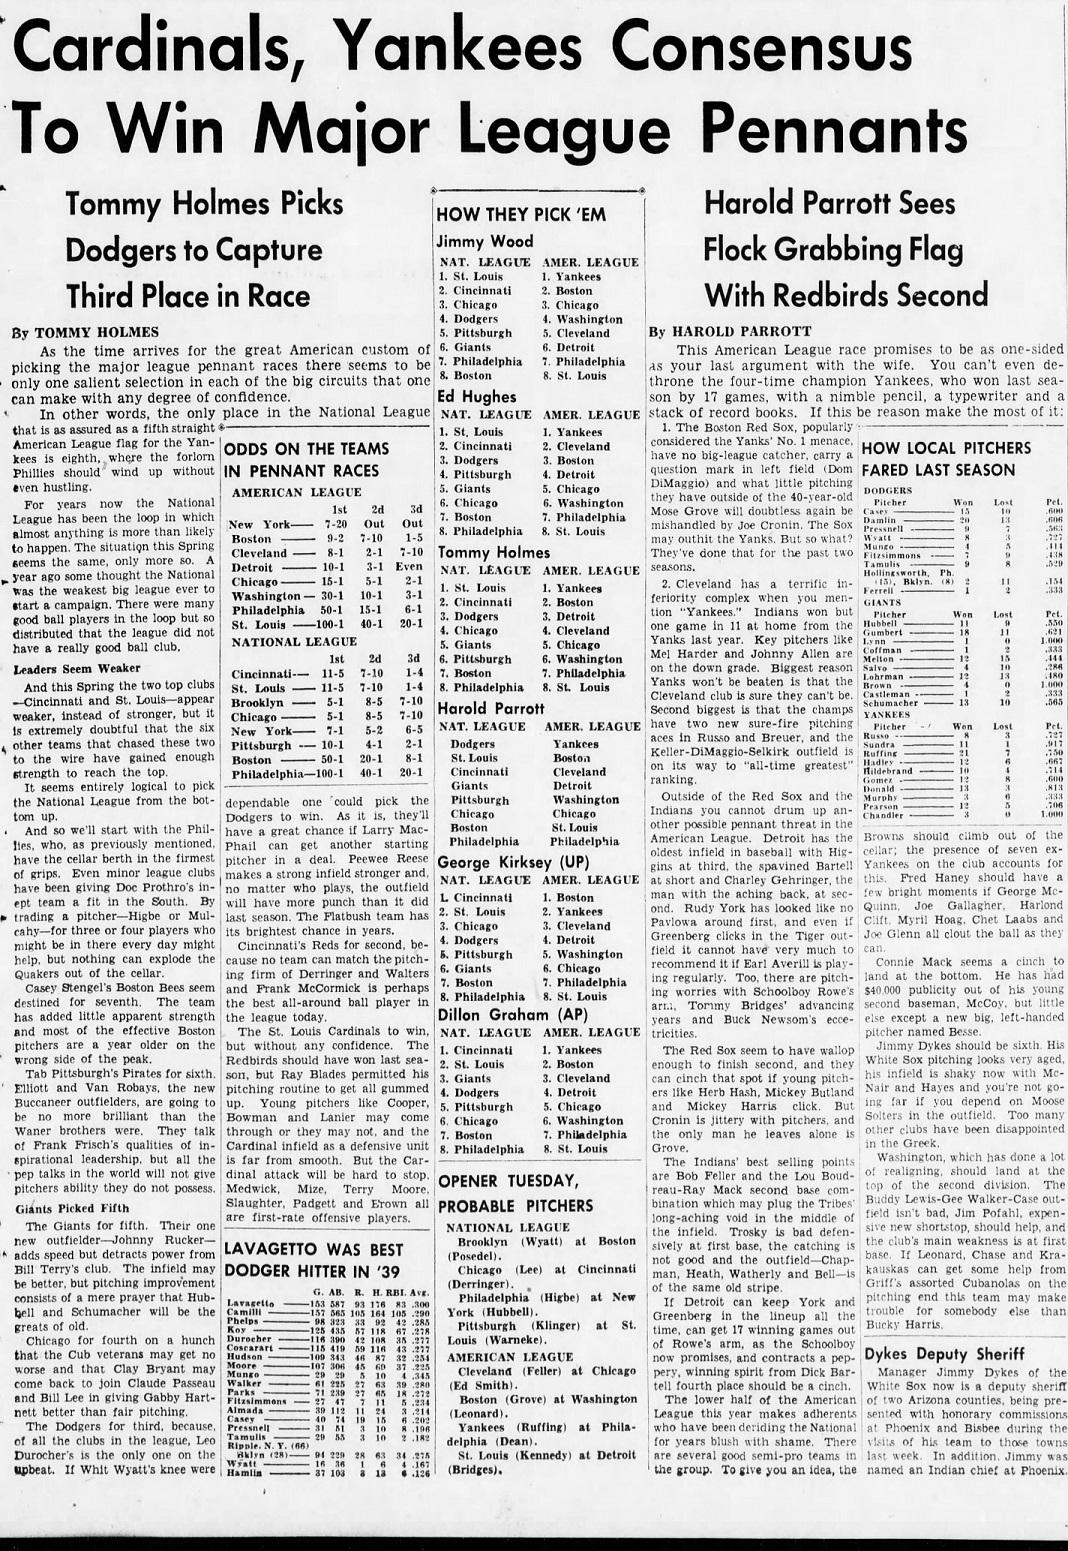 The_Brooklyn_Daily_Eagle_Sun__Apr_14__1940_(3).jpg